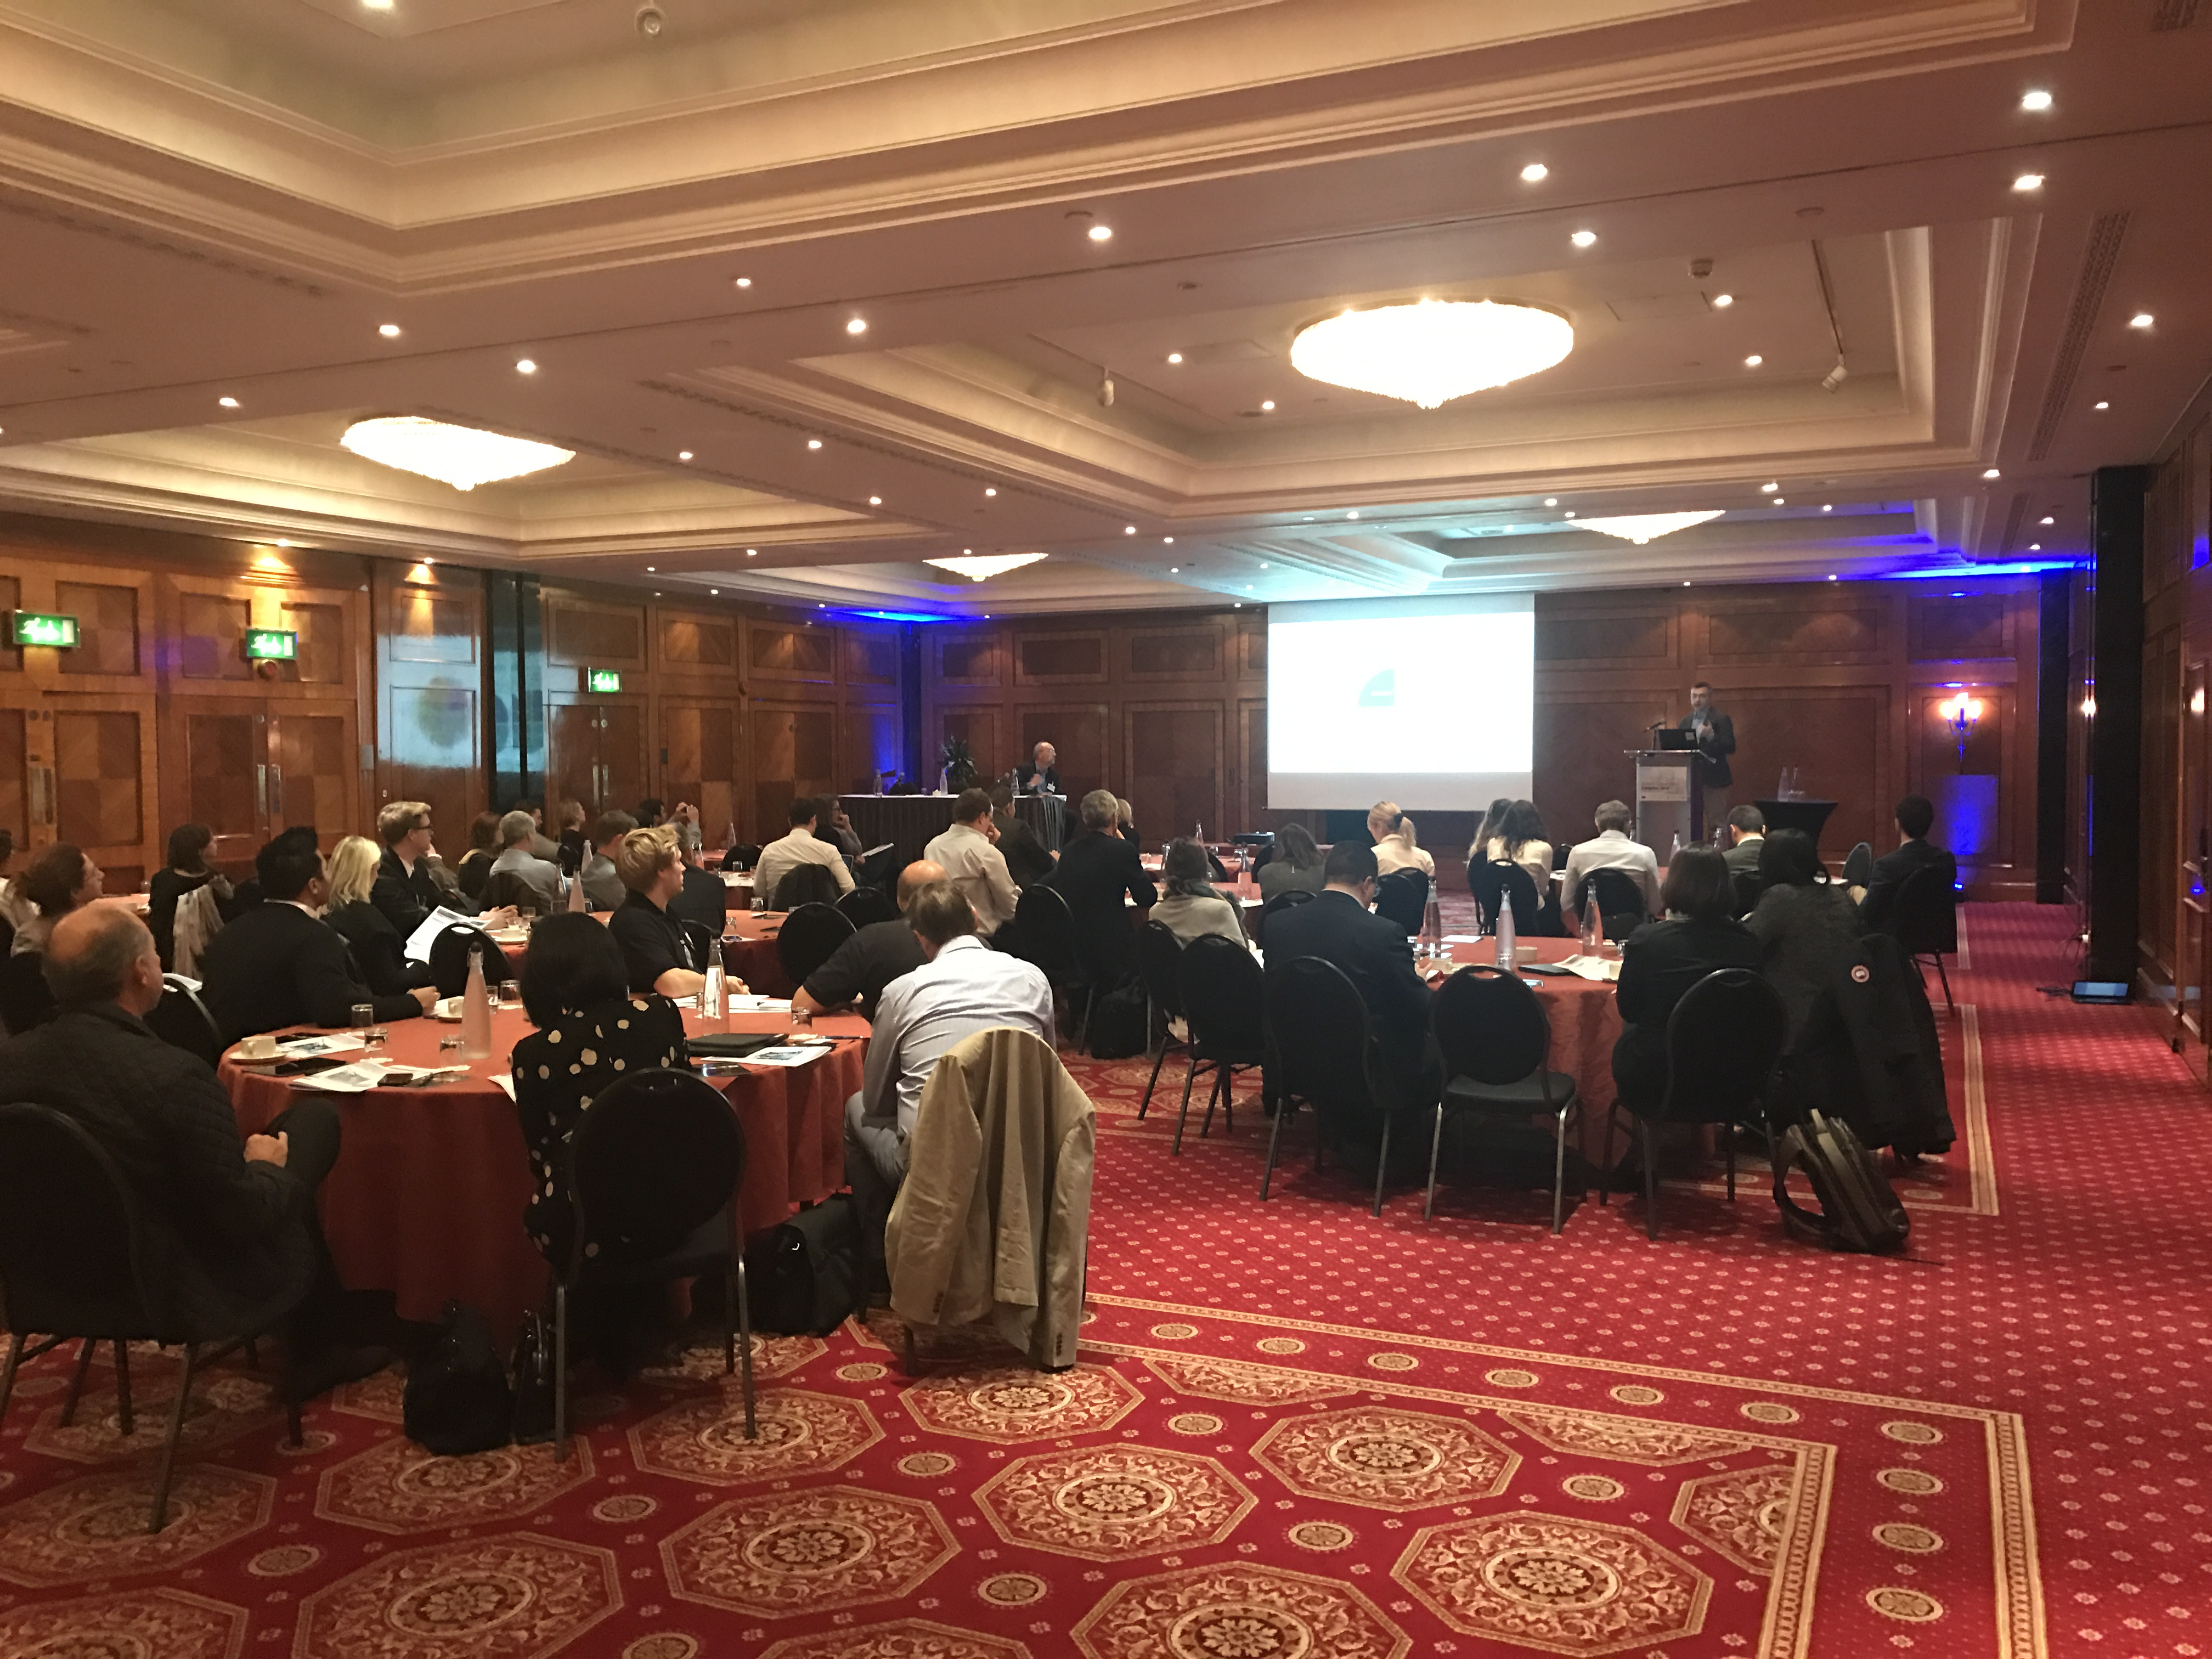 Londra konferans